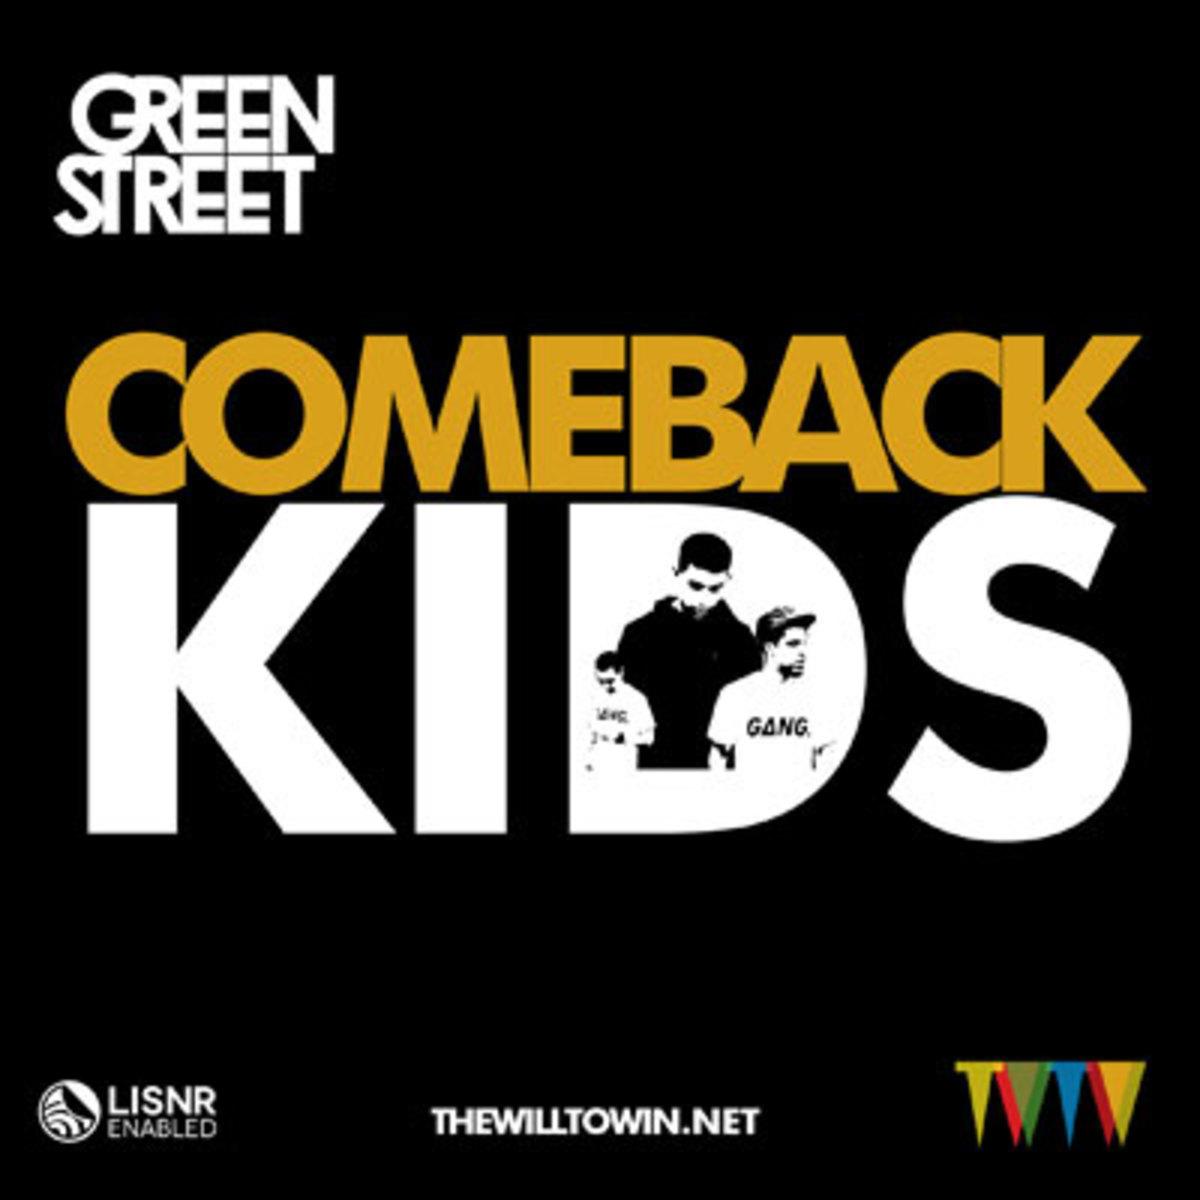 greenstreet-comebackkids.jpg